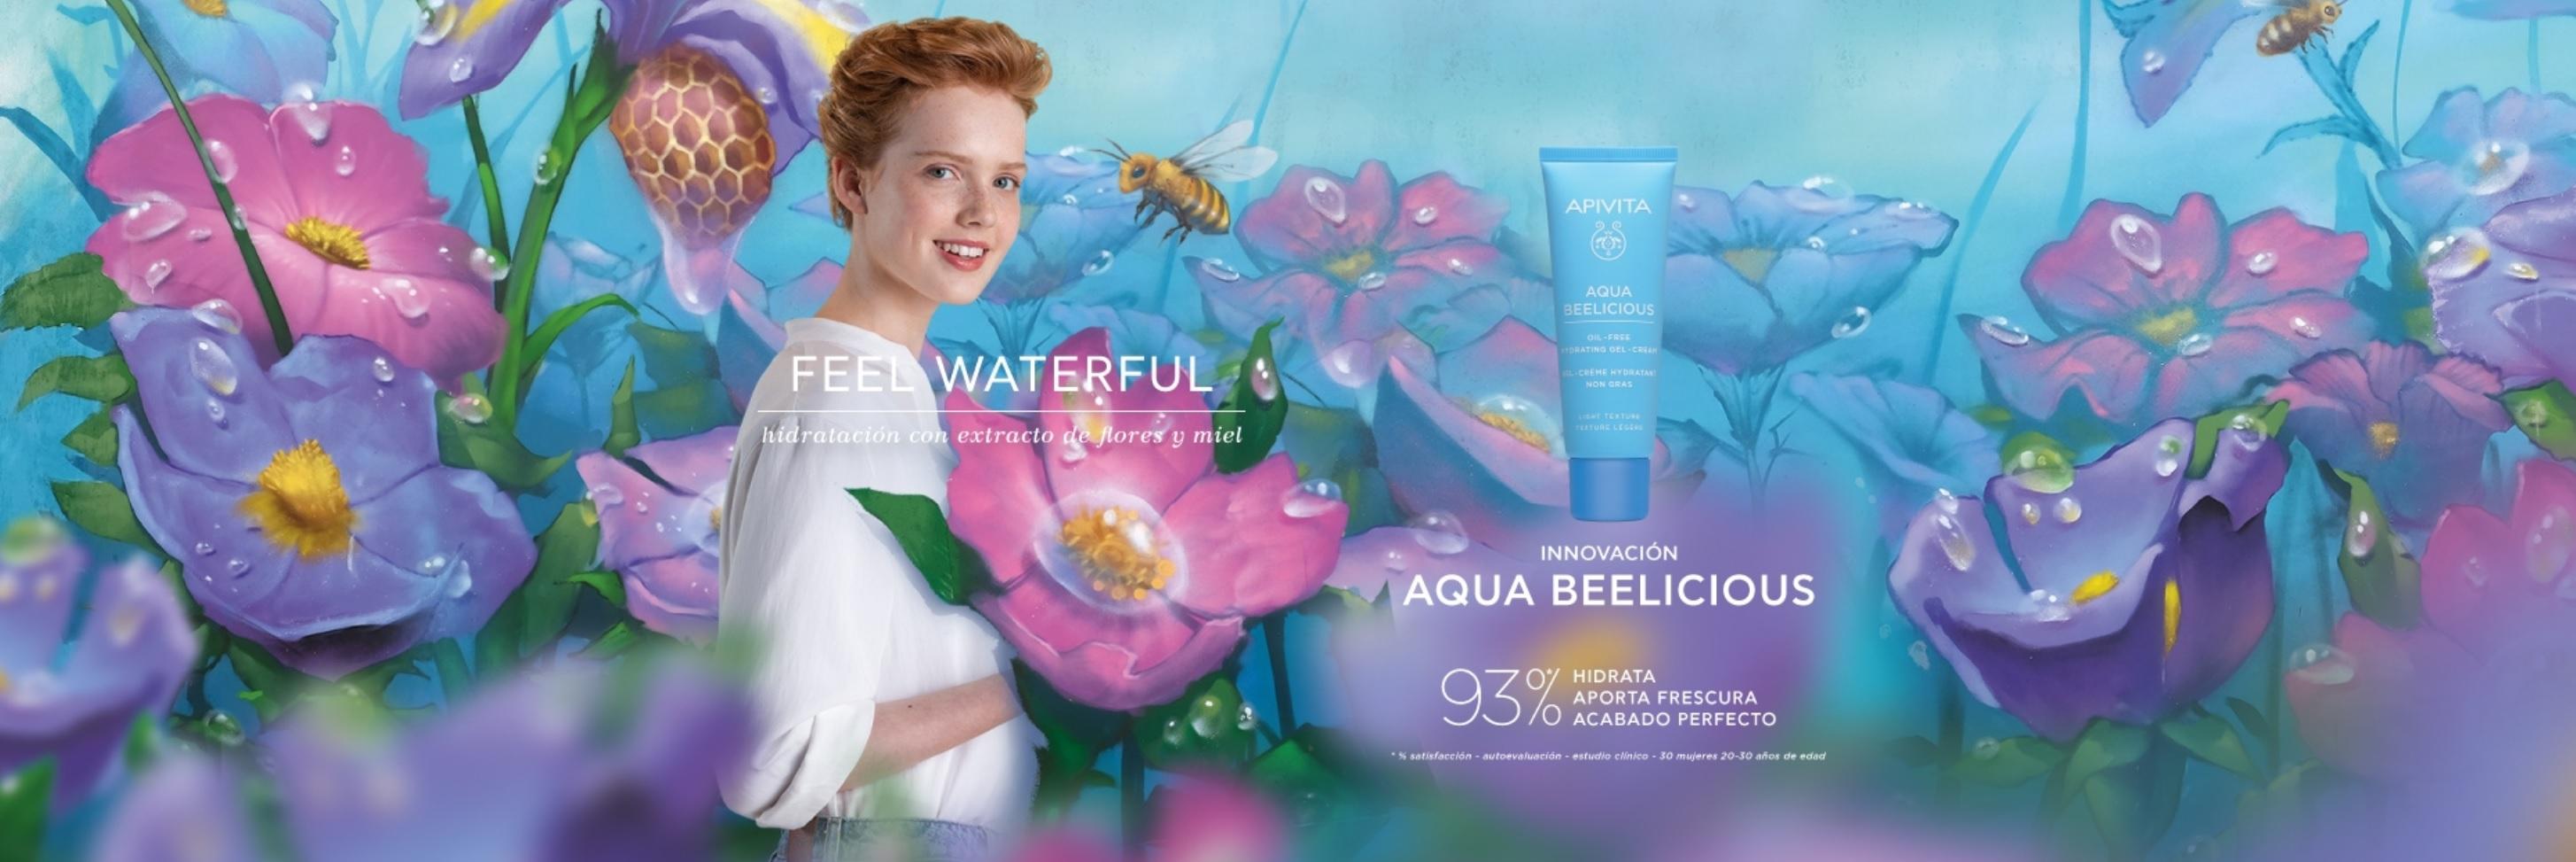 Apivita Aqua Beelicious Crema Oil-free en Farma2go